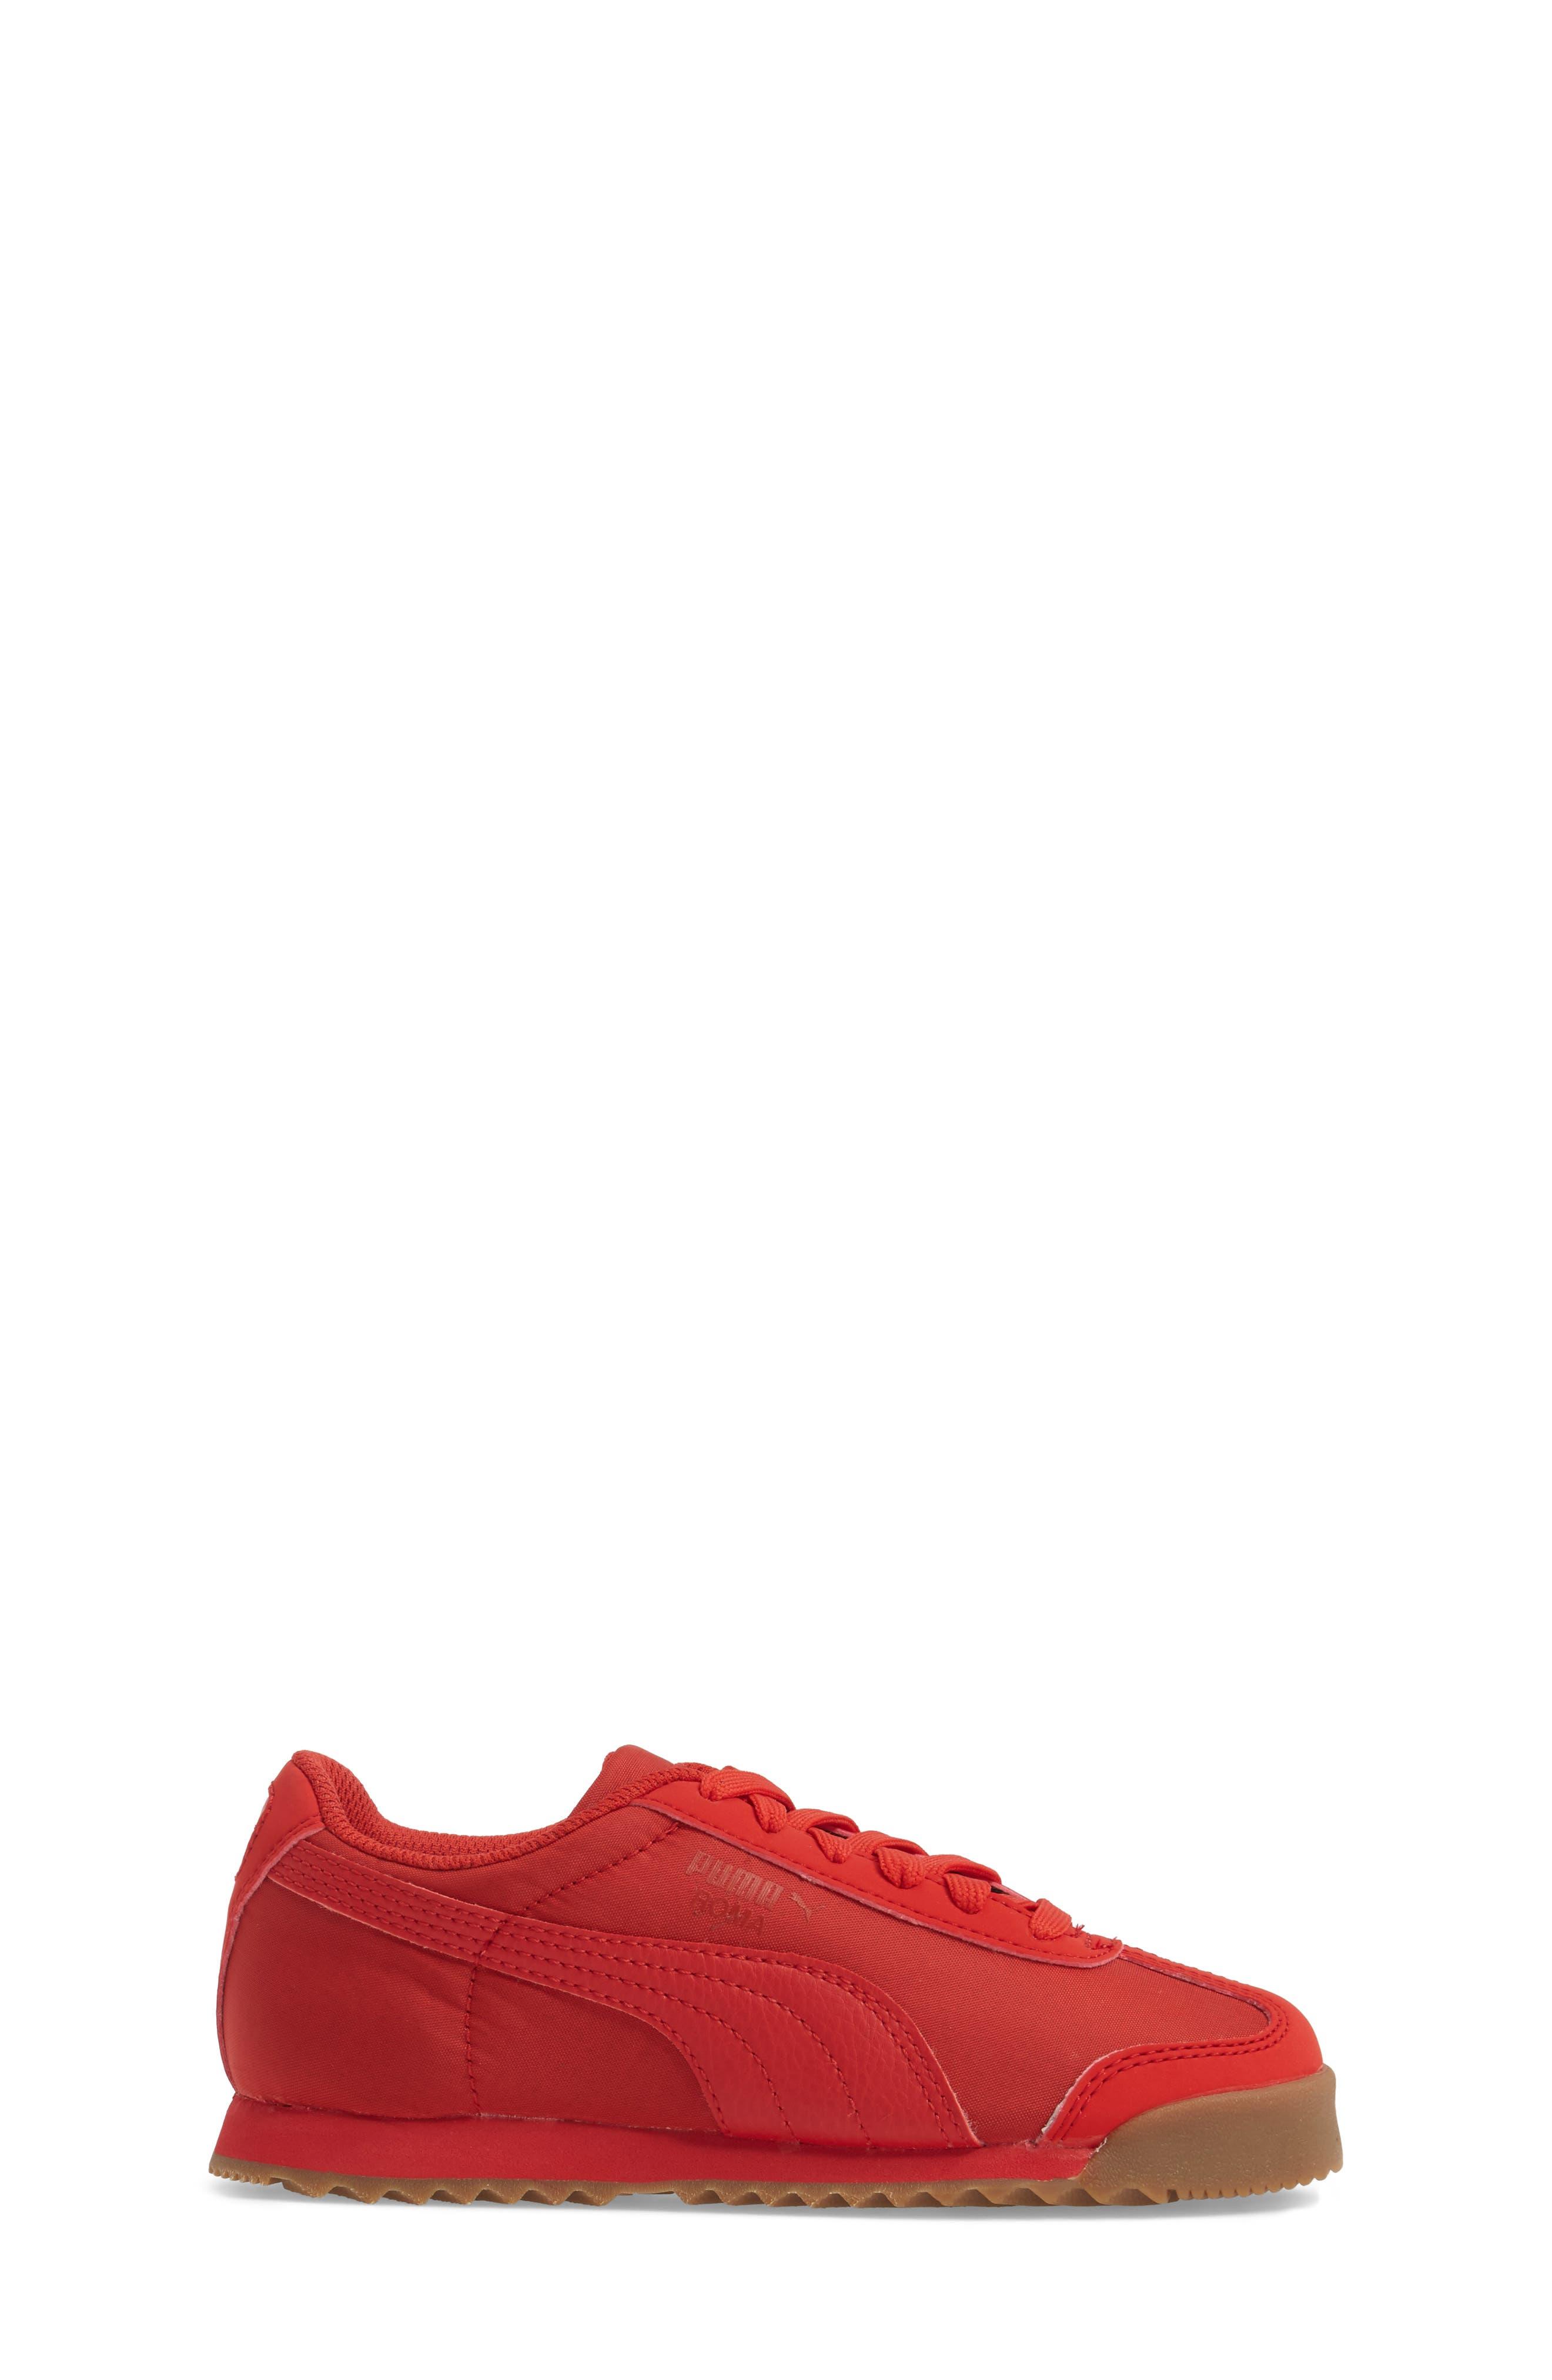 Alternate Image 3  - Puma Roma Basic Summer Sneaker (Toddler, Little Kid & Big Kid)